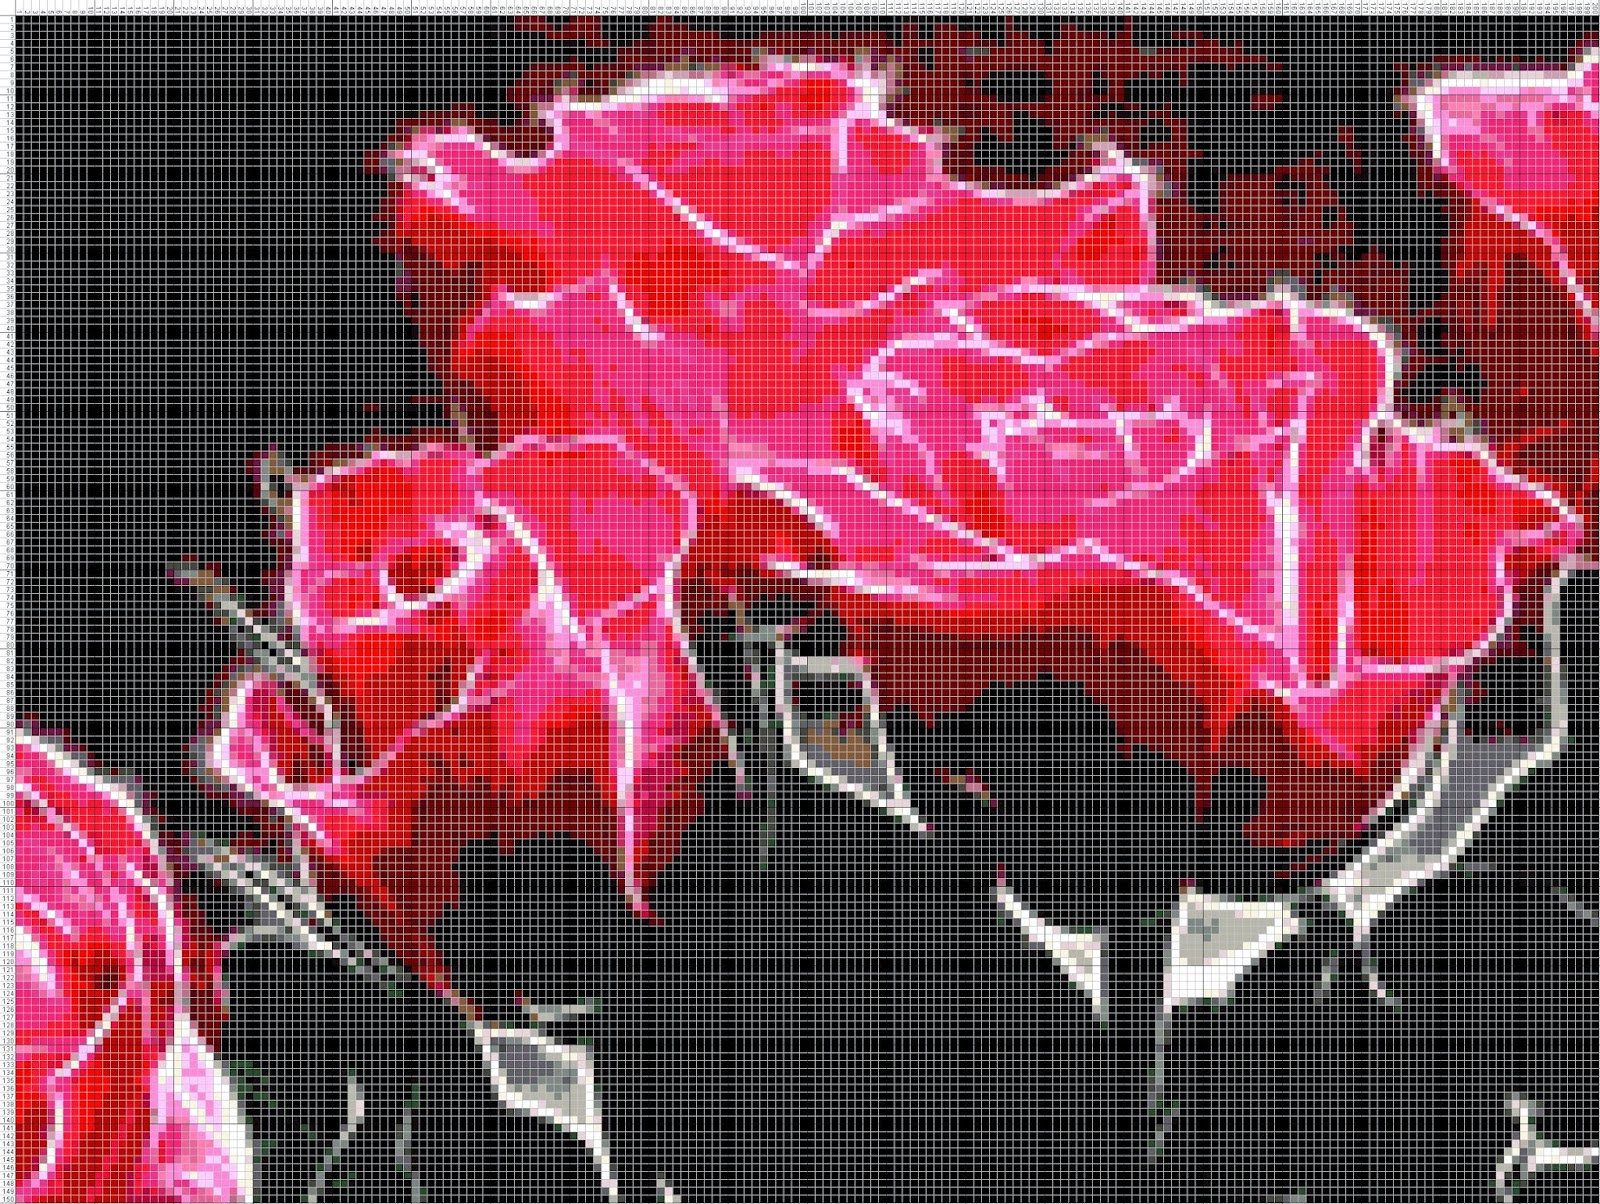 Gambar Pola Kristik Bunga Mawar Merah (2)